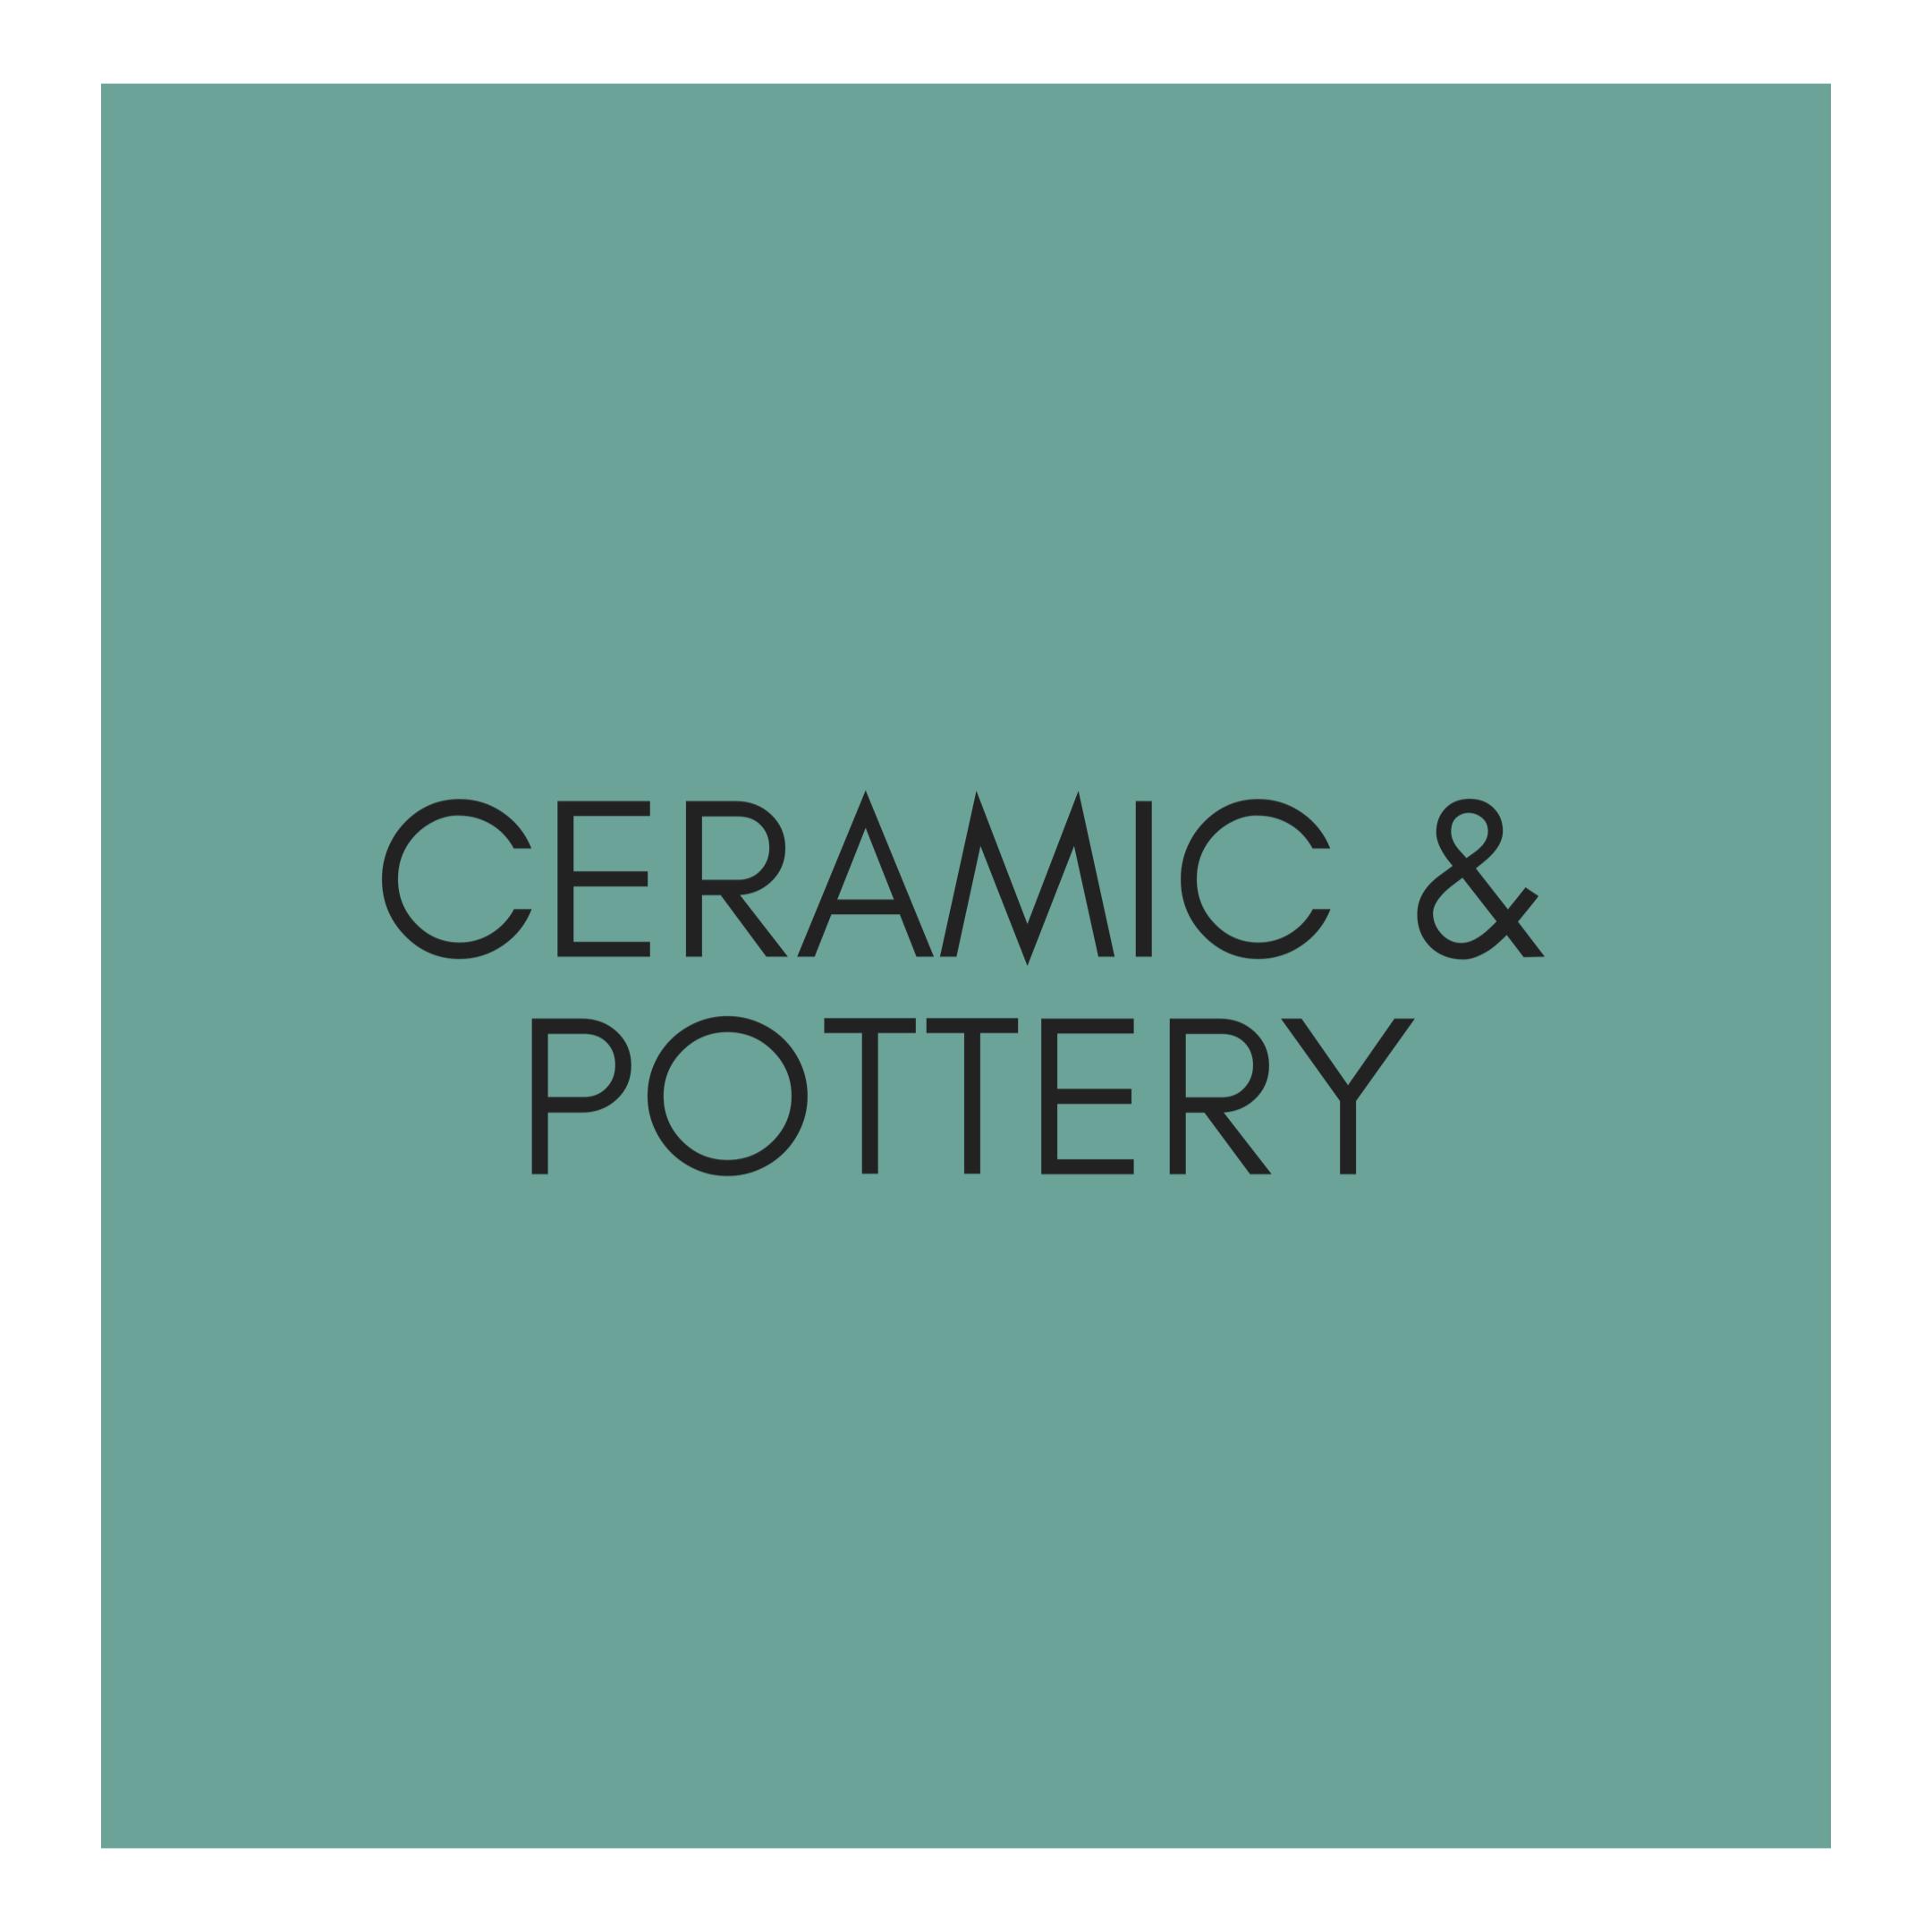 Ceramic & Pottery